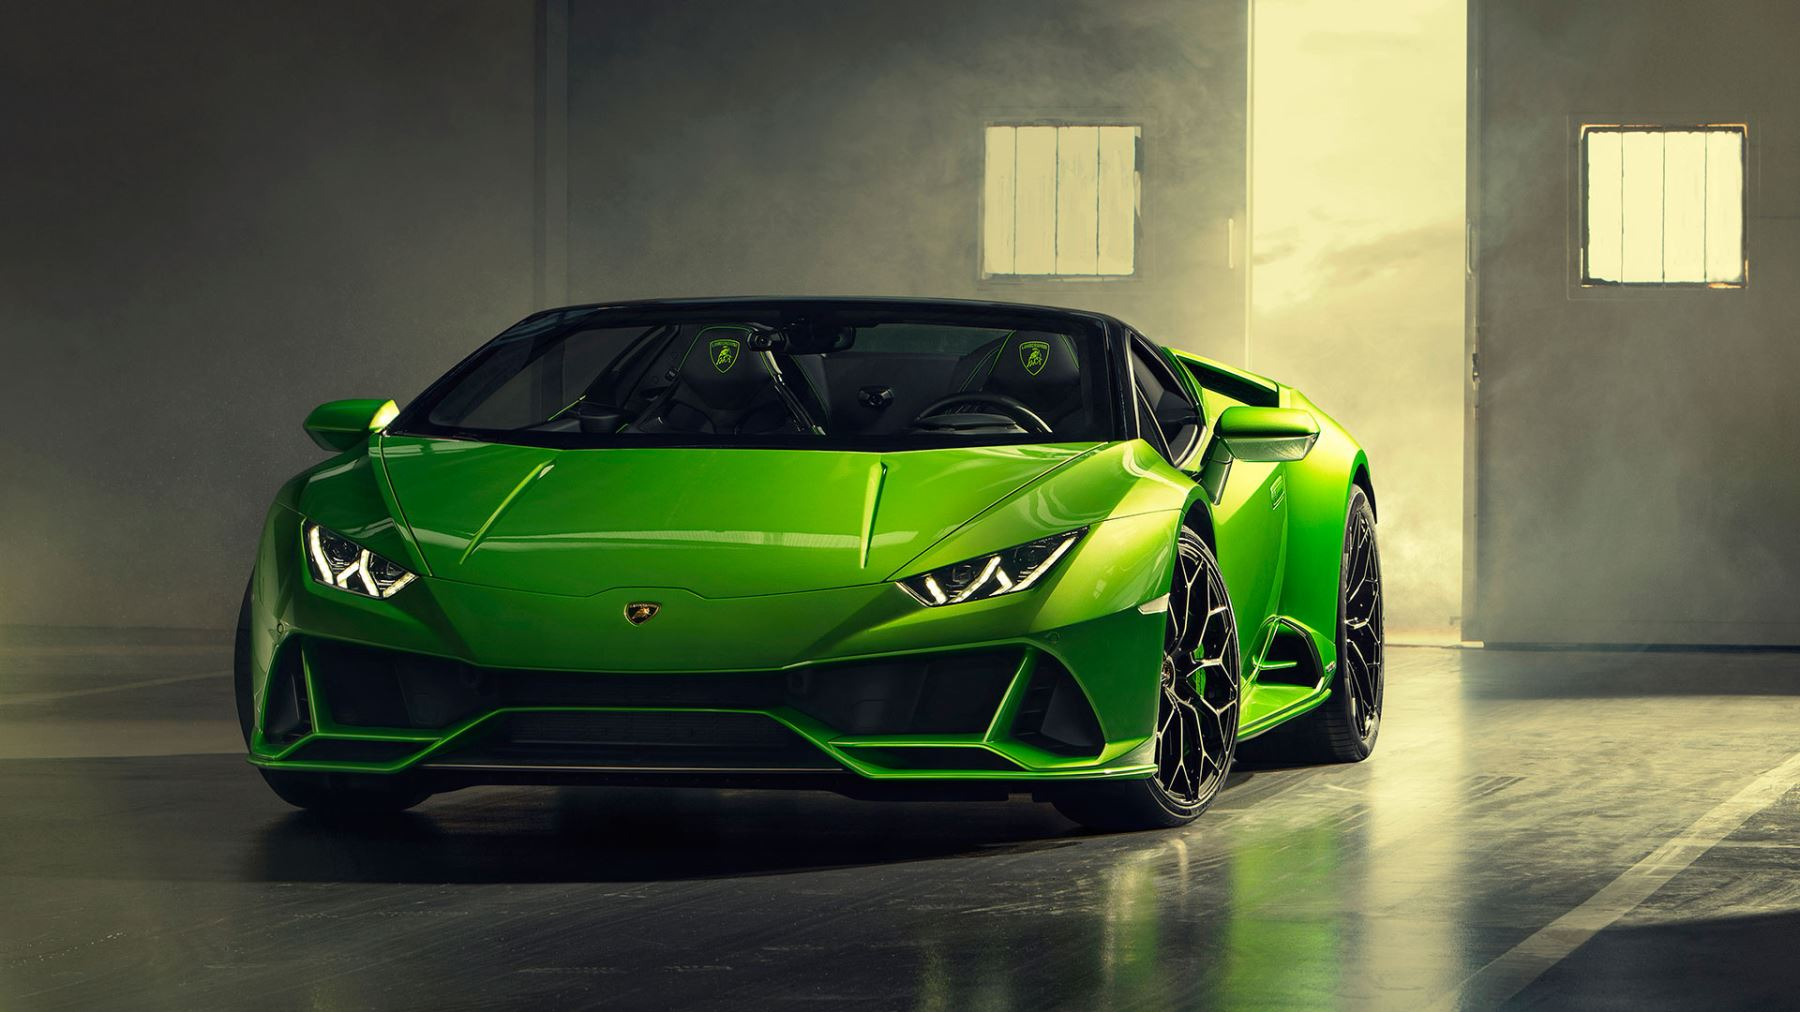 Lamborghini Huracan EVO Spyder - Every Day Amplified image 7